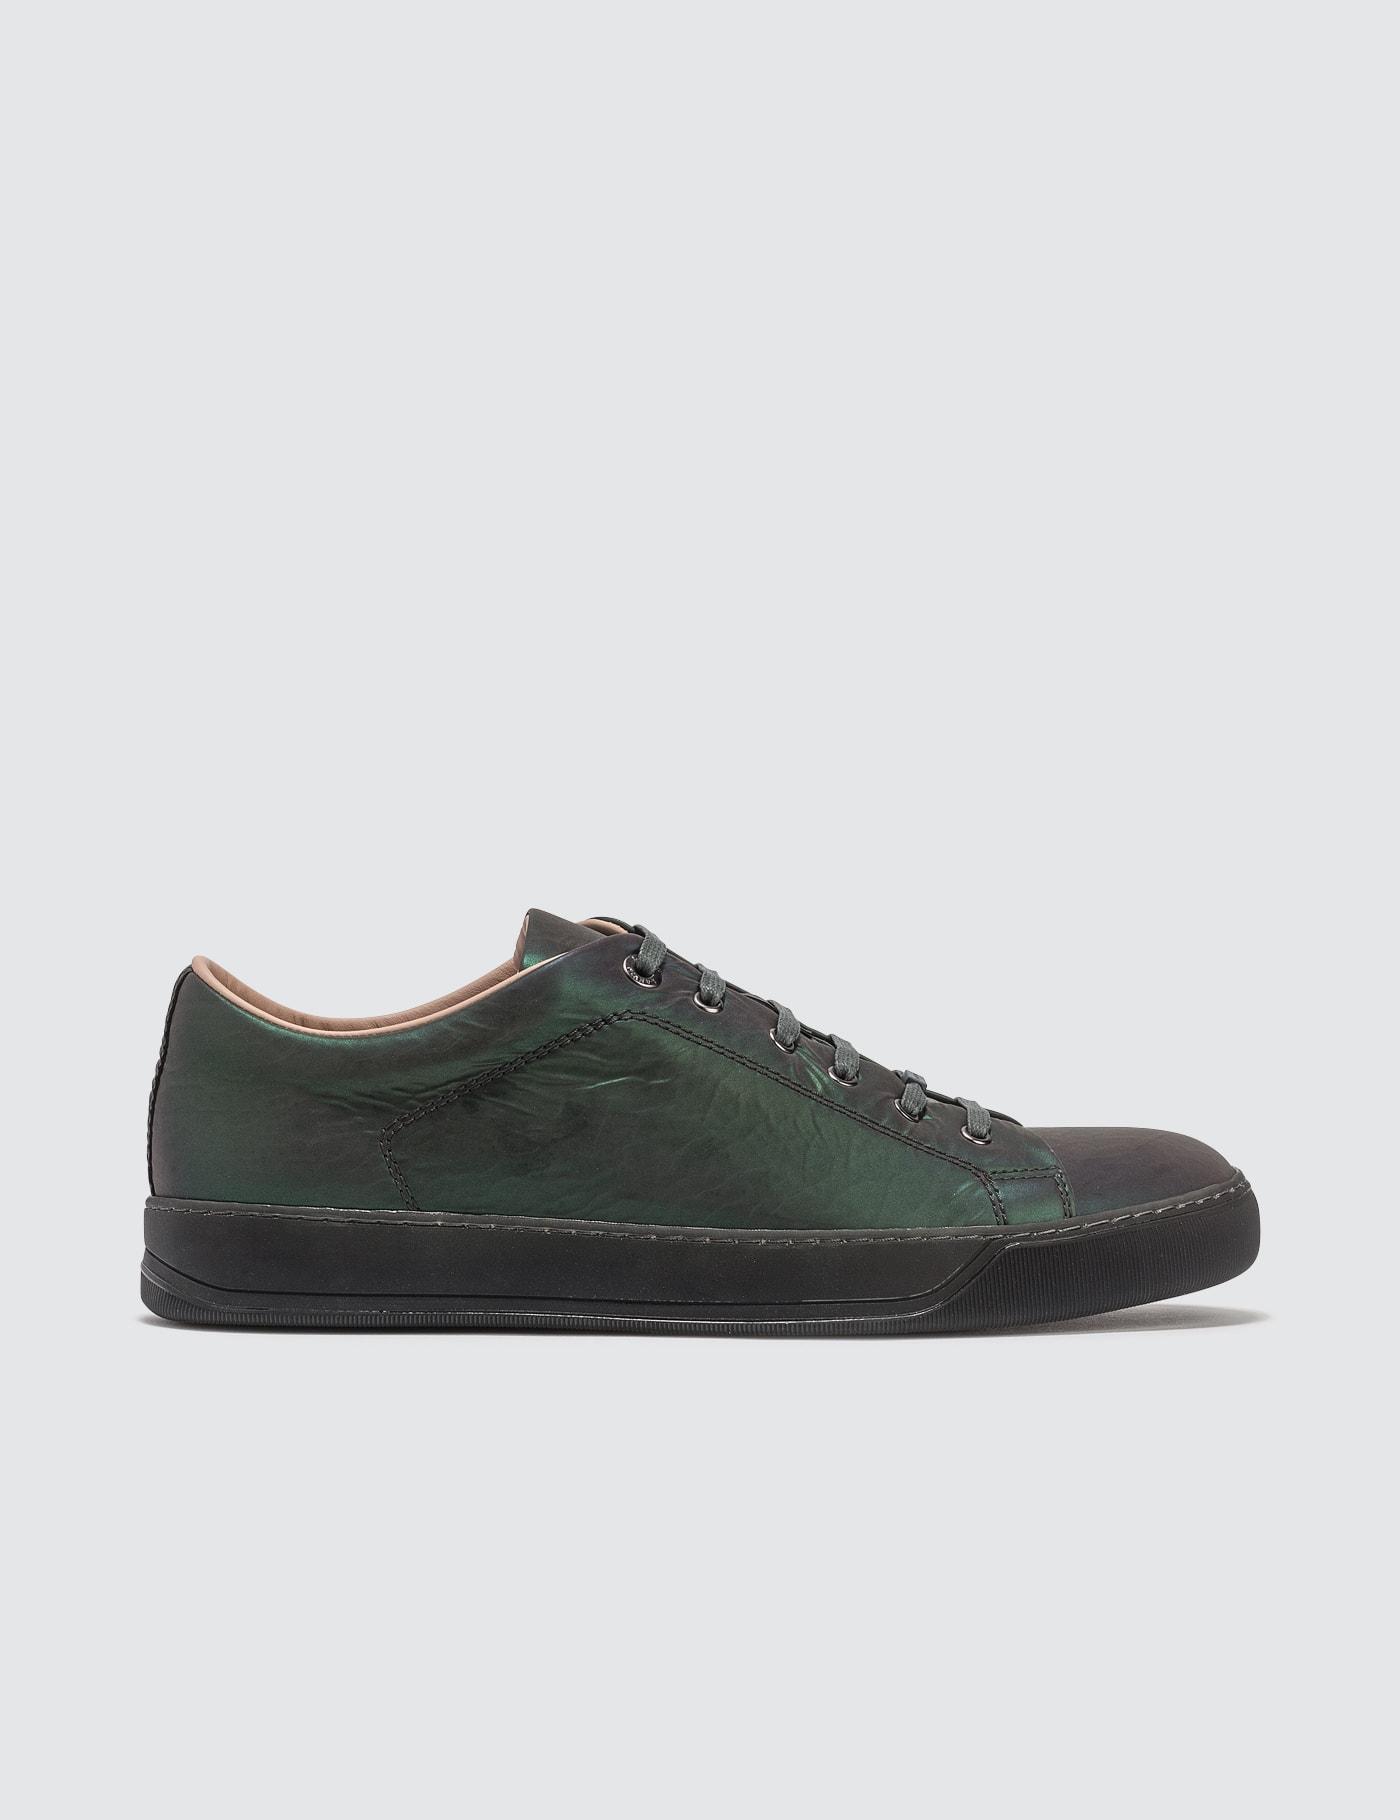 Low Top Sneaker Matt Reflective Calf